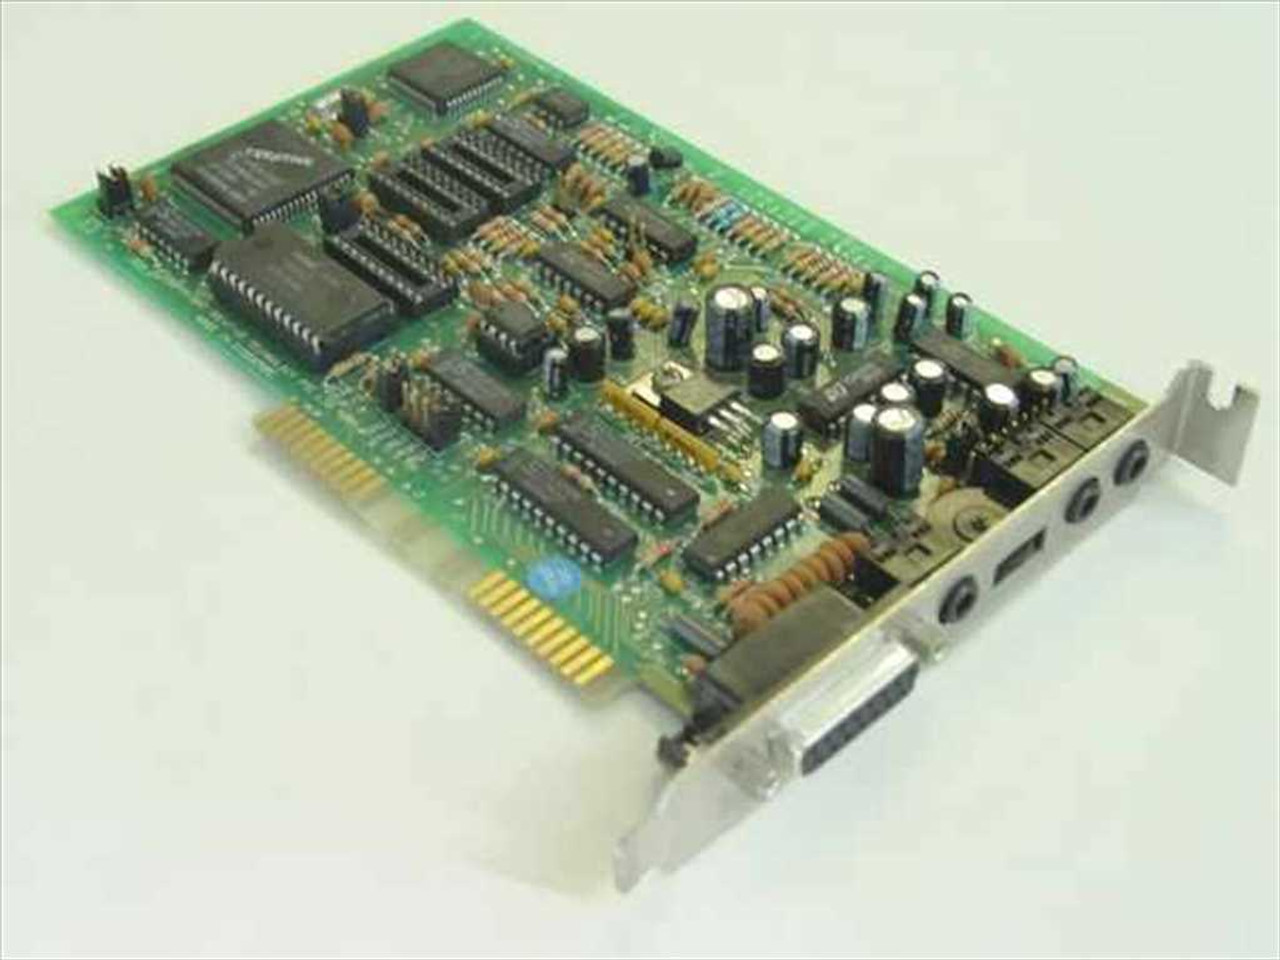 Game Port Creative Labs CT4170 16-Bit ISA Sound Blaster 16 Sound Card TESTED